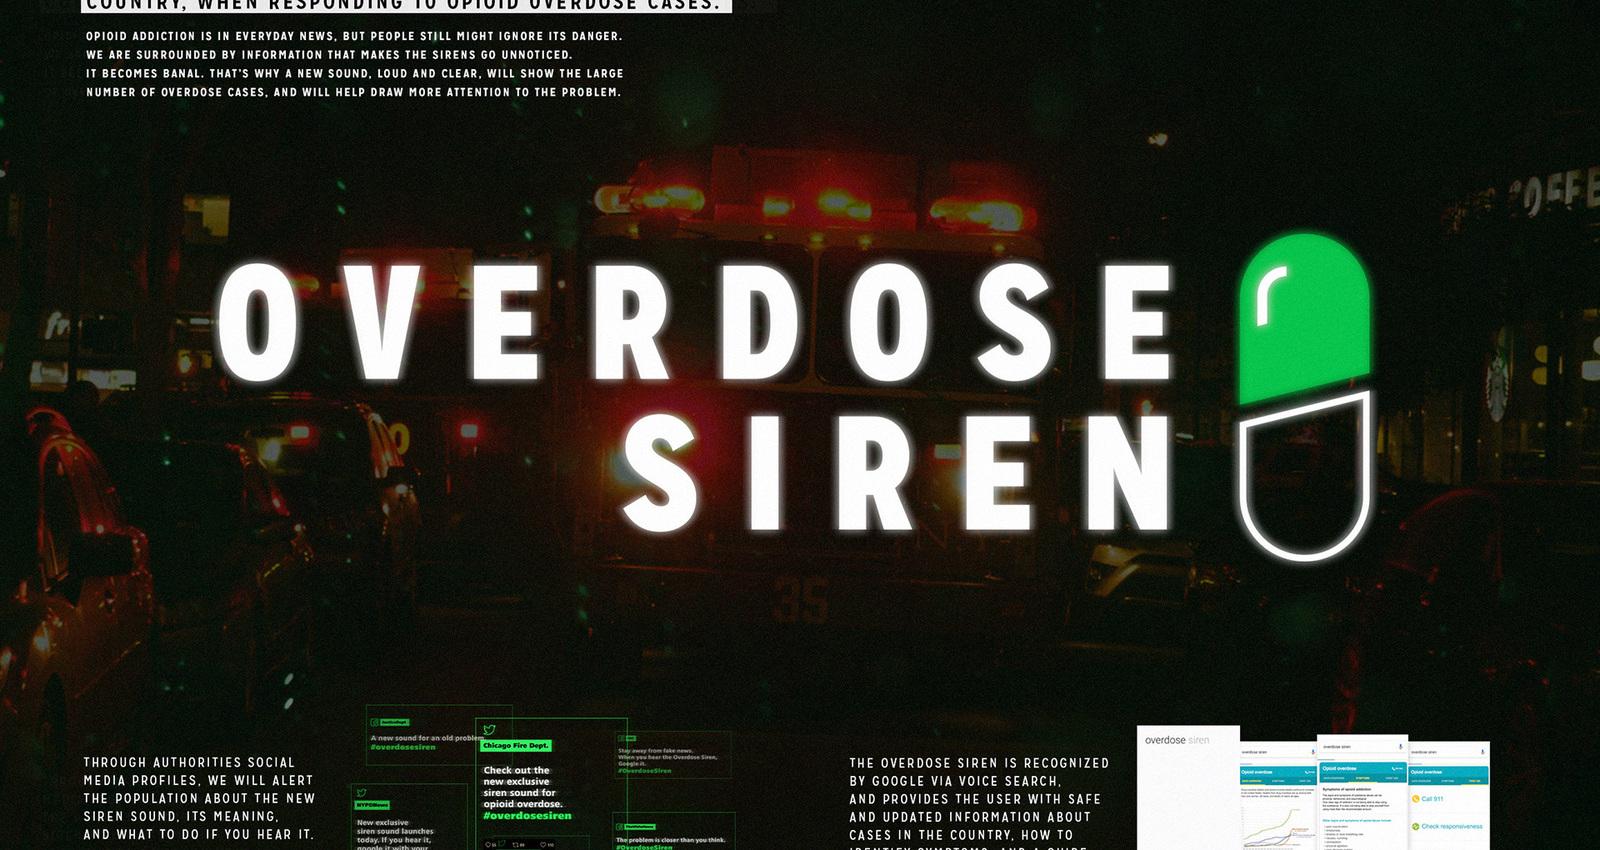 Overdose Siren